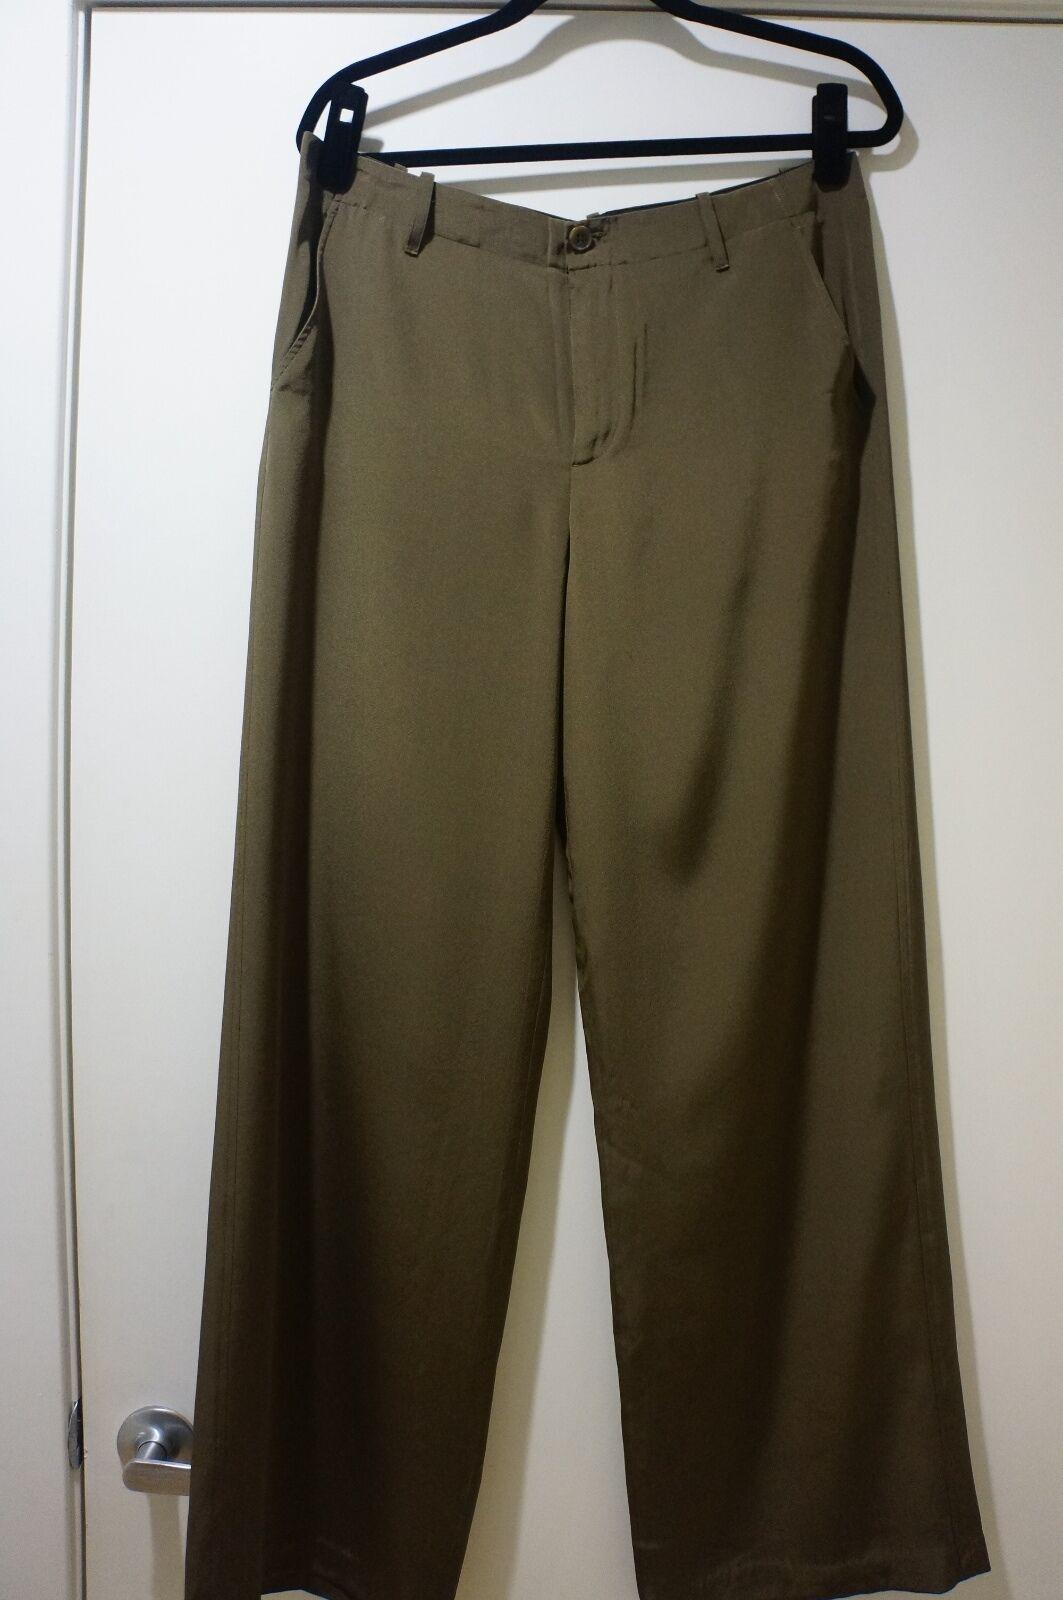 295 NWT VINCE Wide Leg 100% Slik Olive Green Brown Trousers Pants Sz 8